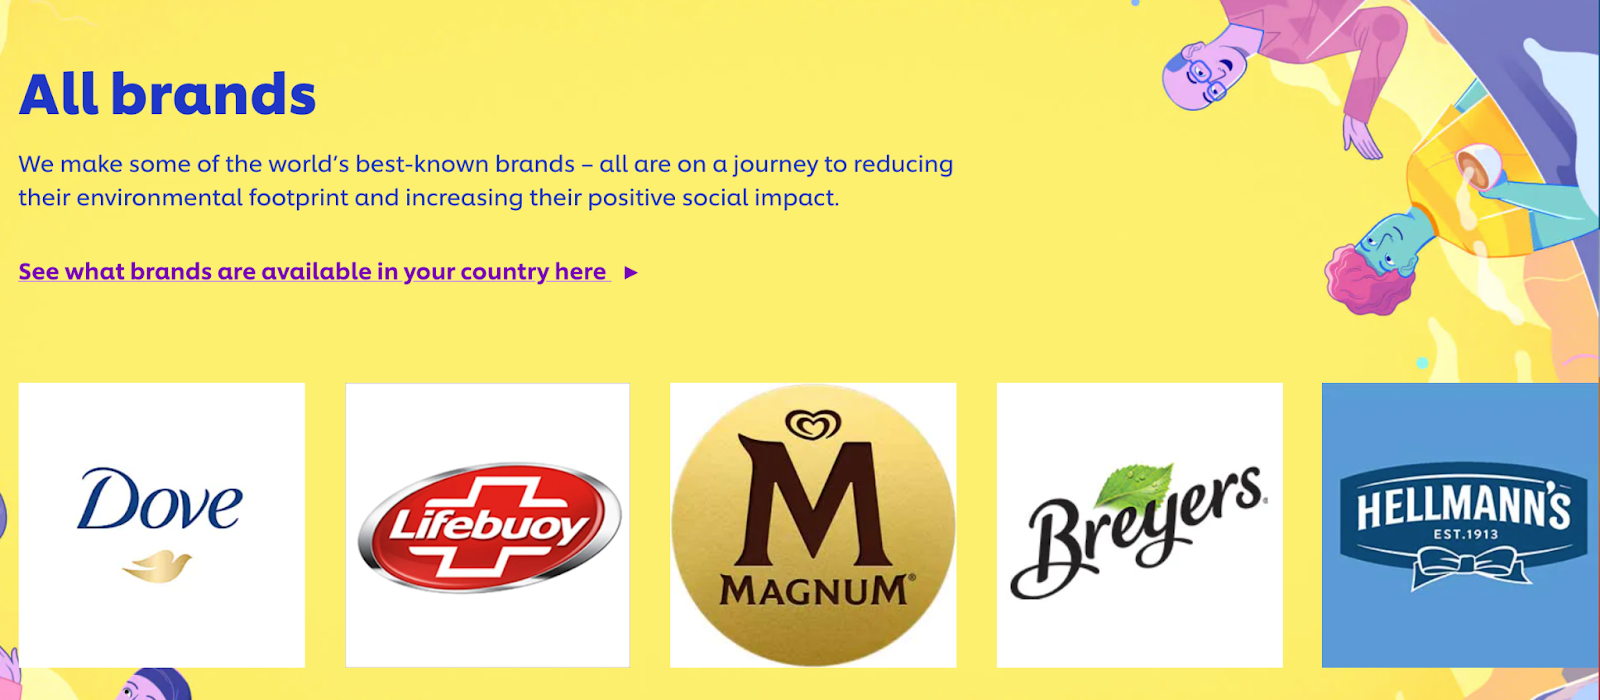 Unilever diversification market development strategy example